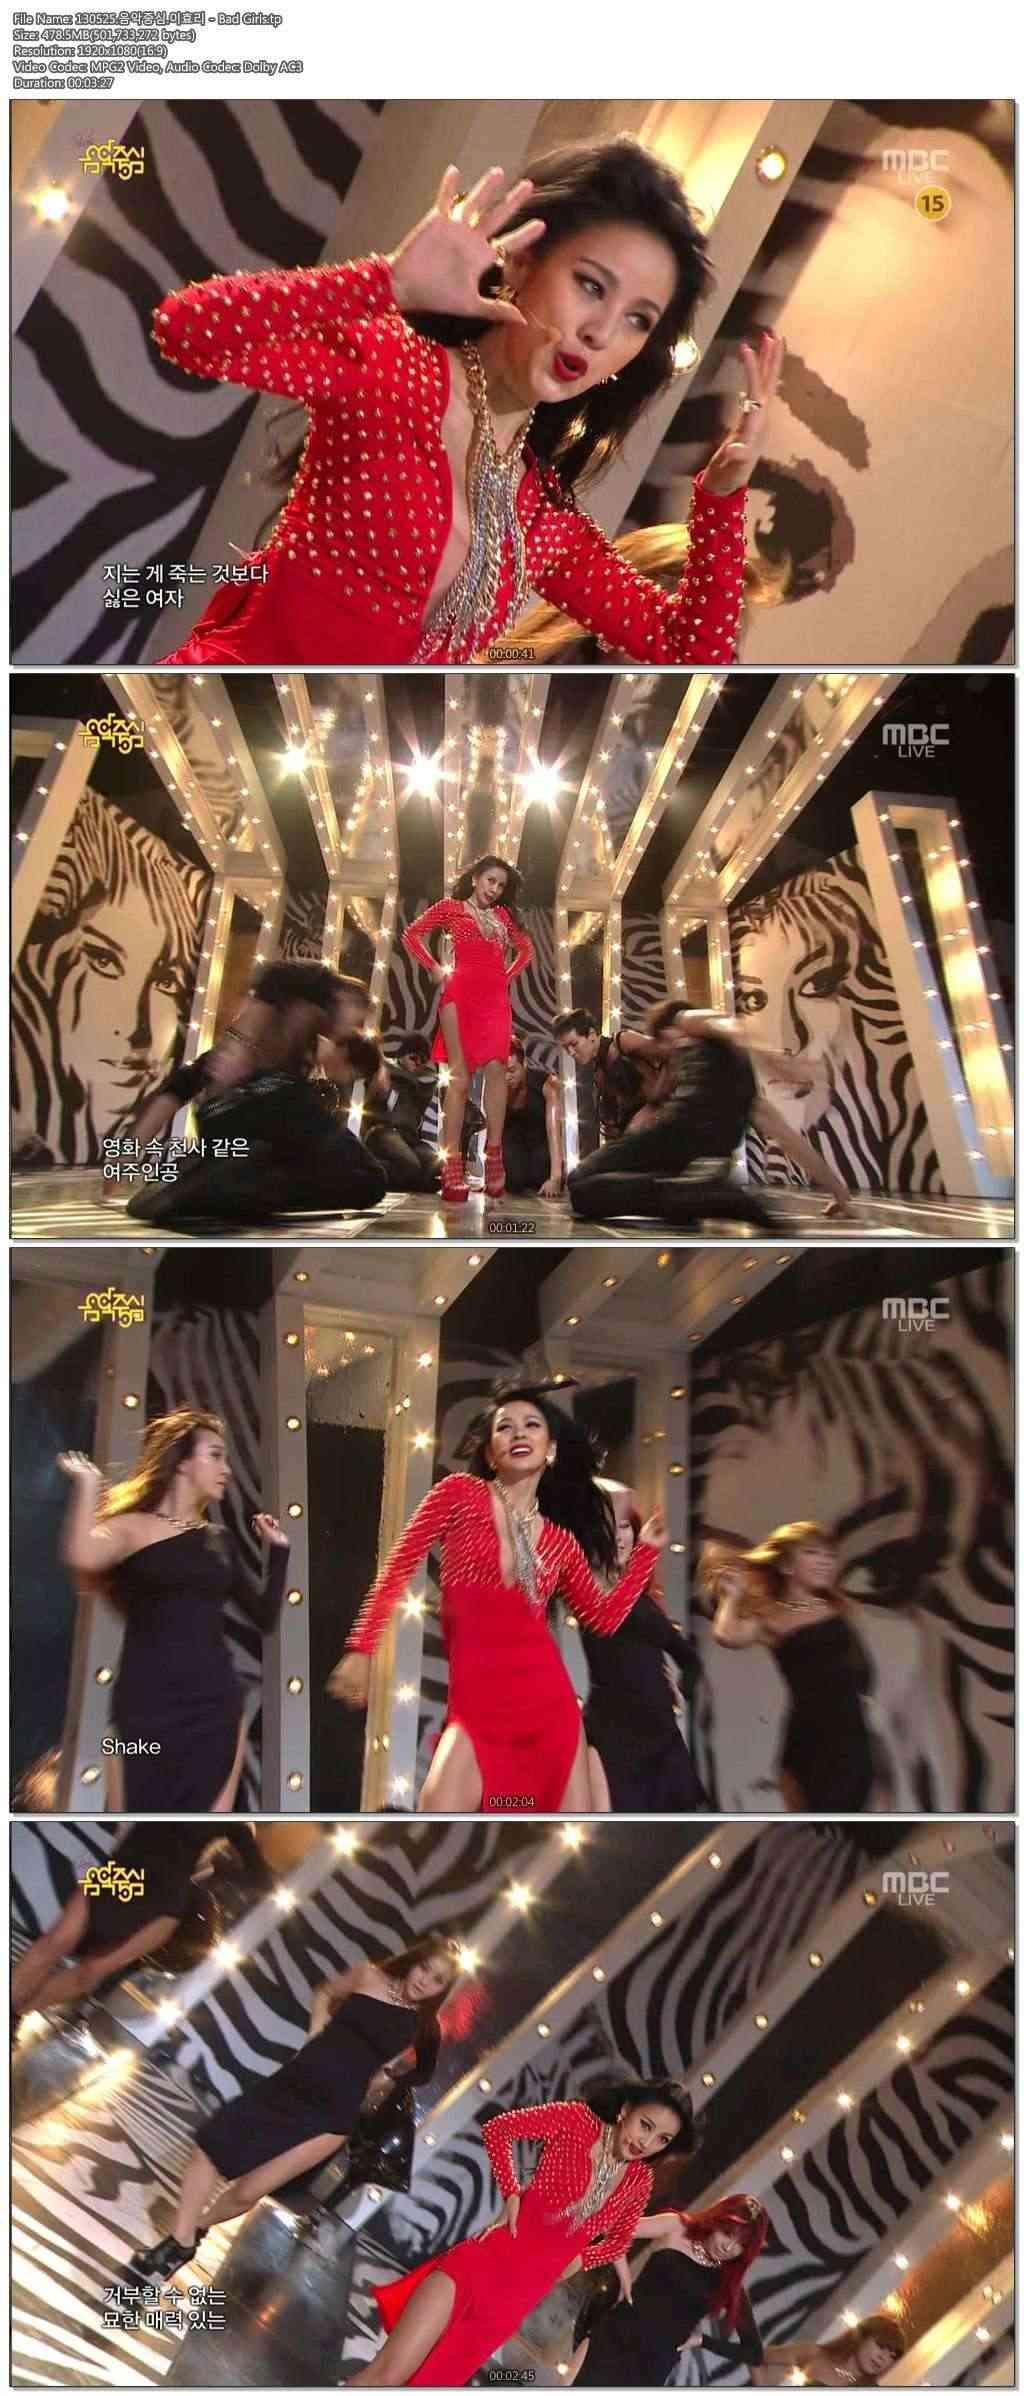 [130525] Hyori - Waiting Room, Holly Jolly Bus & Bad Girls @ MBC Music Core Mhzcjn10